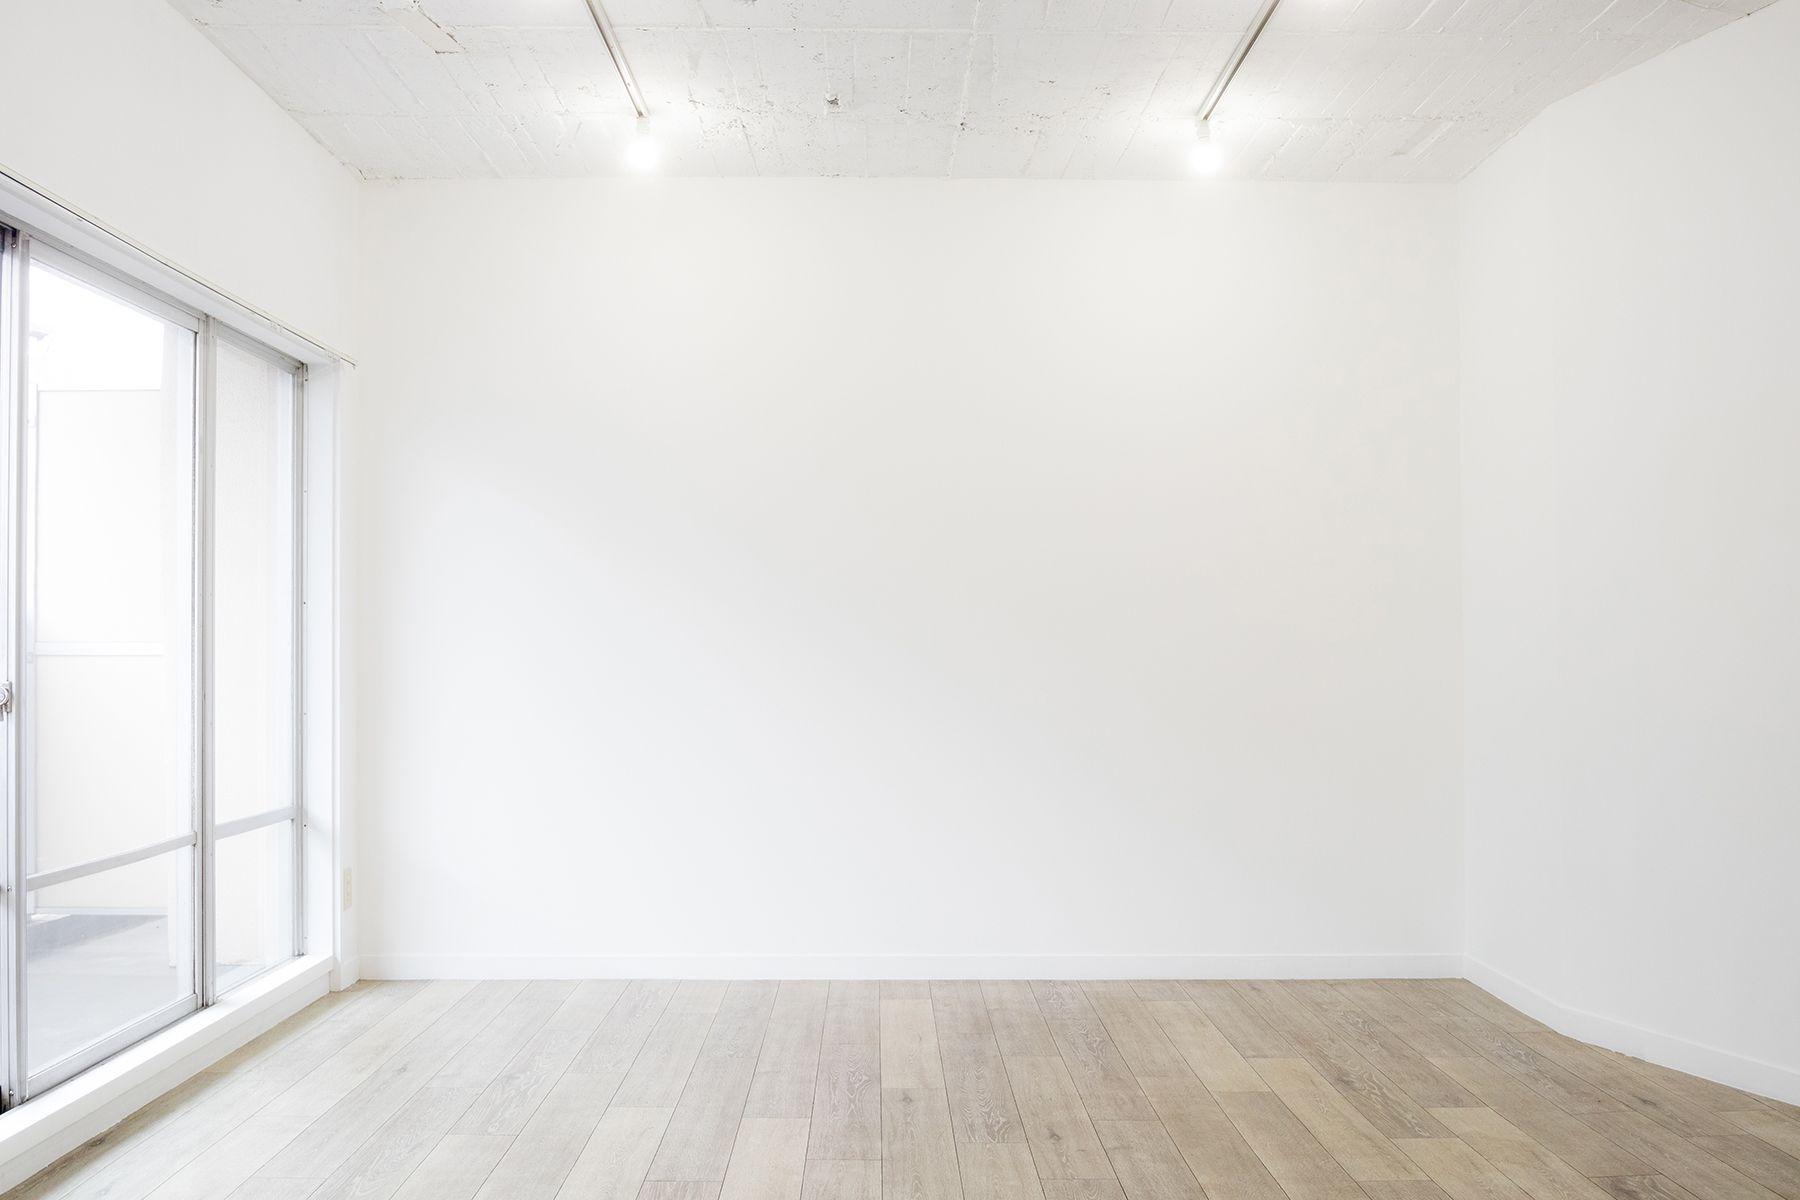 Studio Serato 代々木 (スタジオセラート代々木)1200Wストロボ2灯セット(有料)